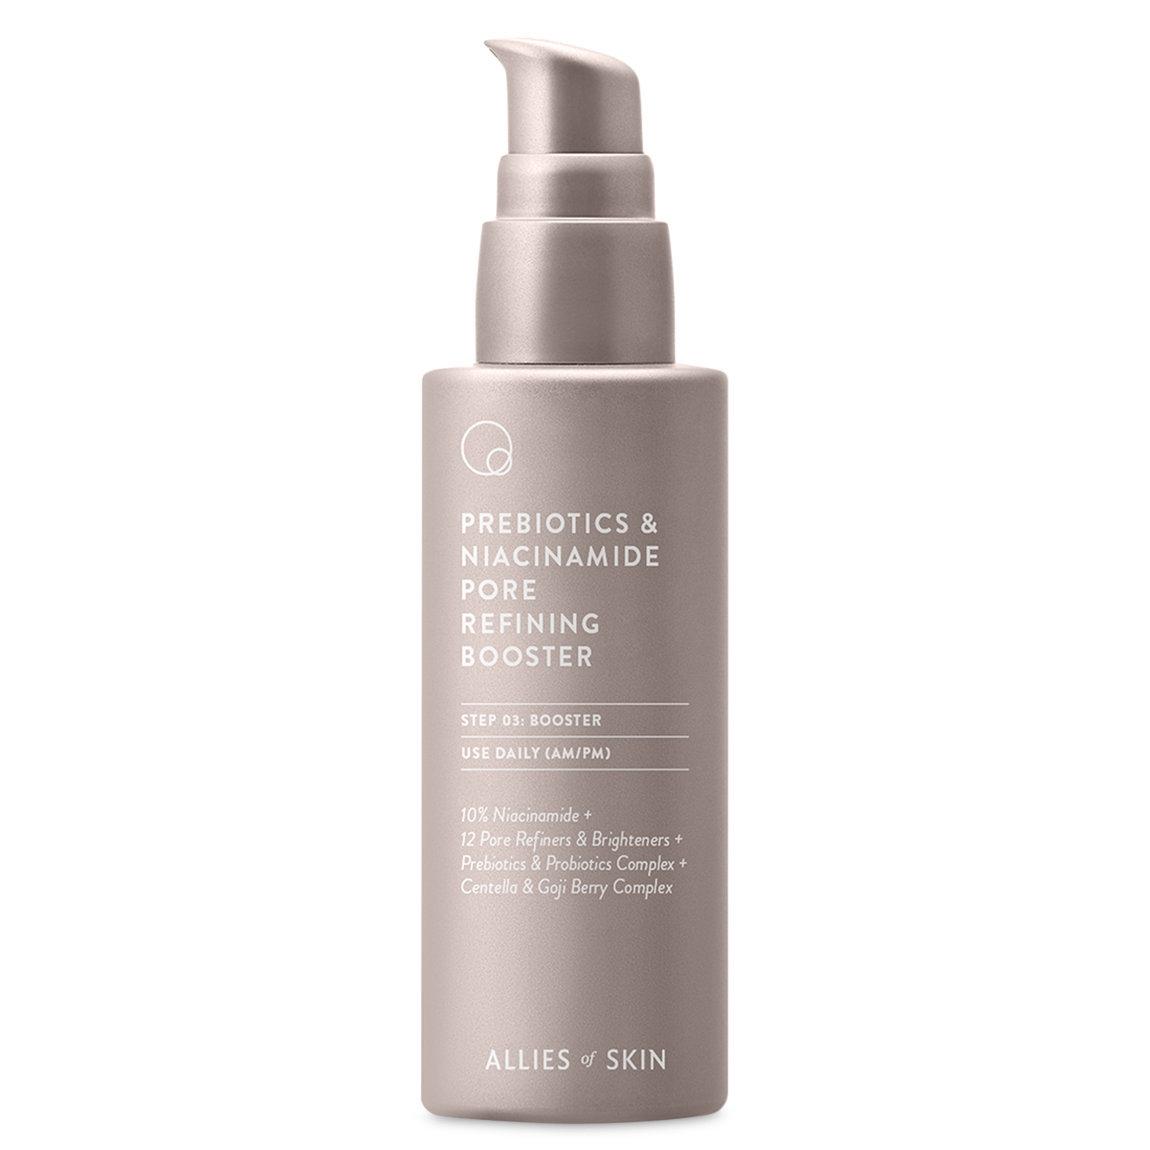 Allies of Skin Prebiotics & Niacinamide Pore Refining Booster alternative view 1 - product swatch.